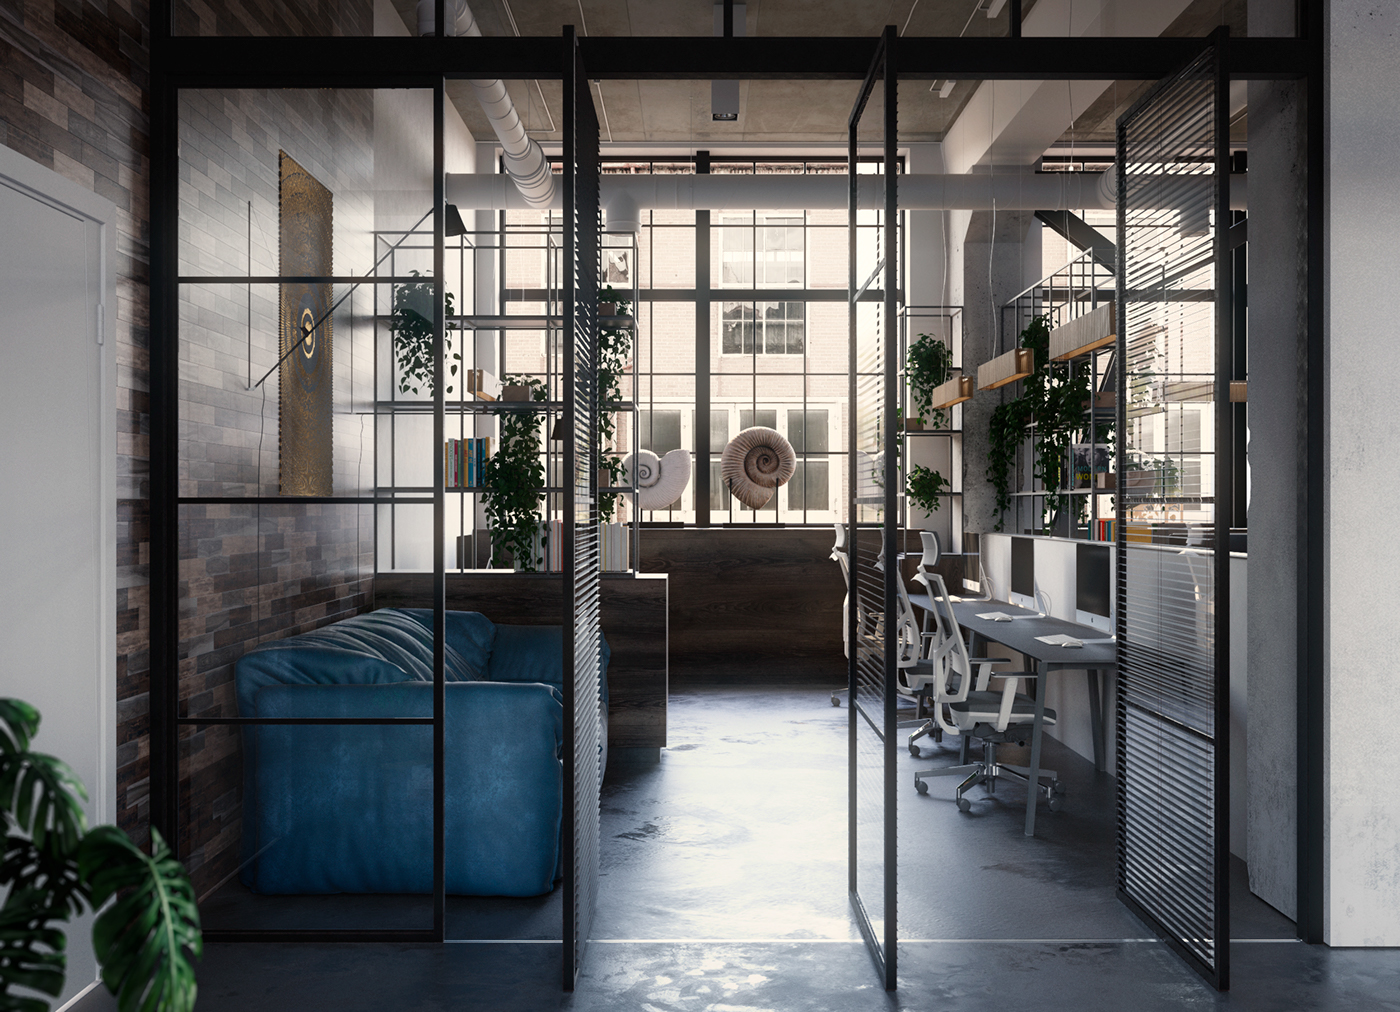 Industrial office on Behance